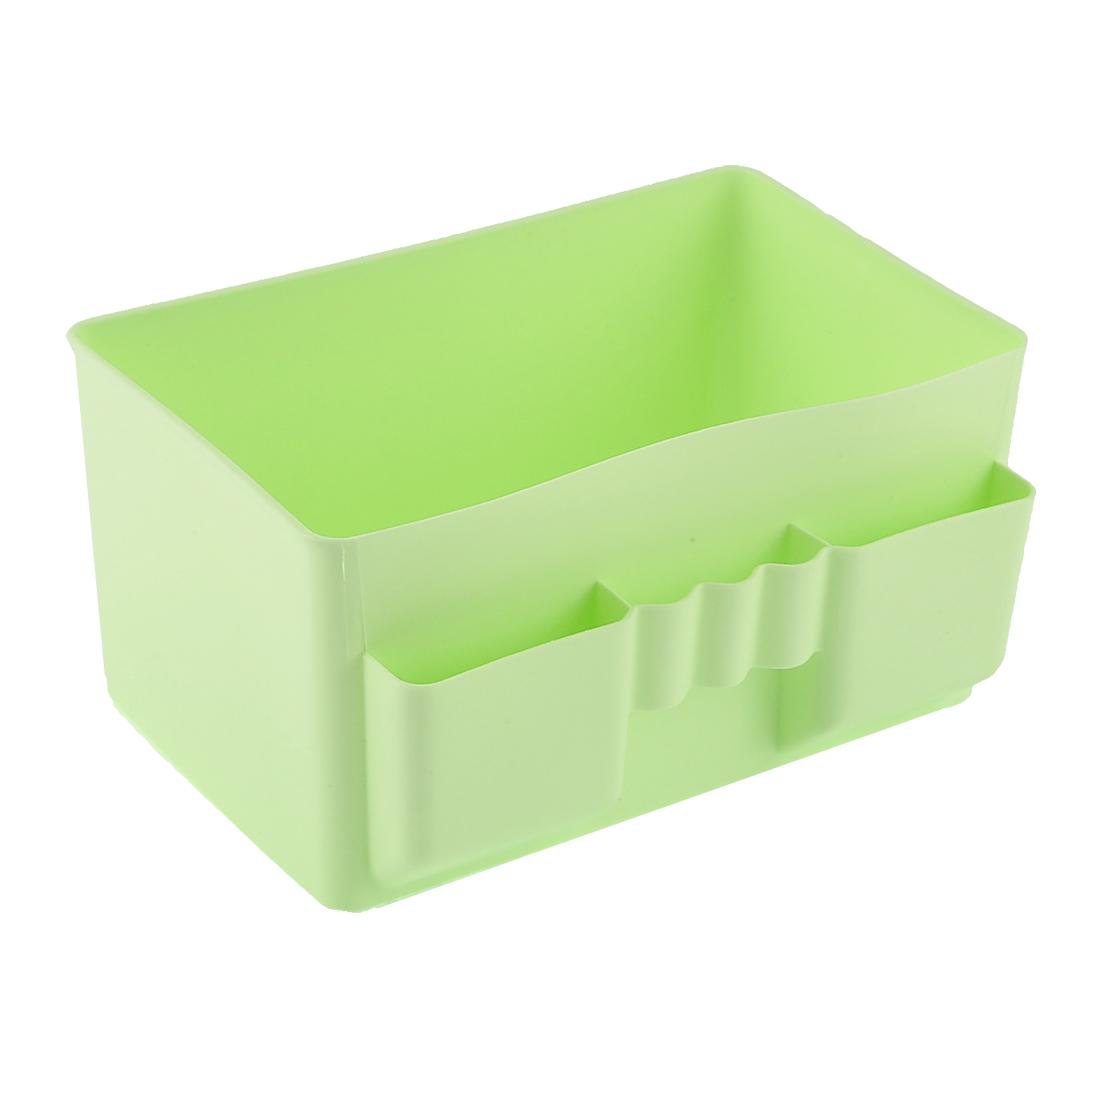 Office Household Table Desk Plastic Storage Case Basket Divider Box Green